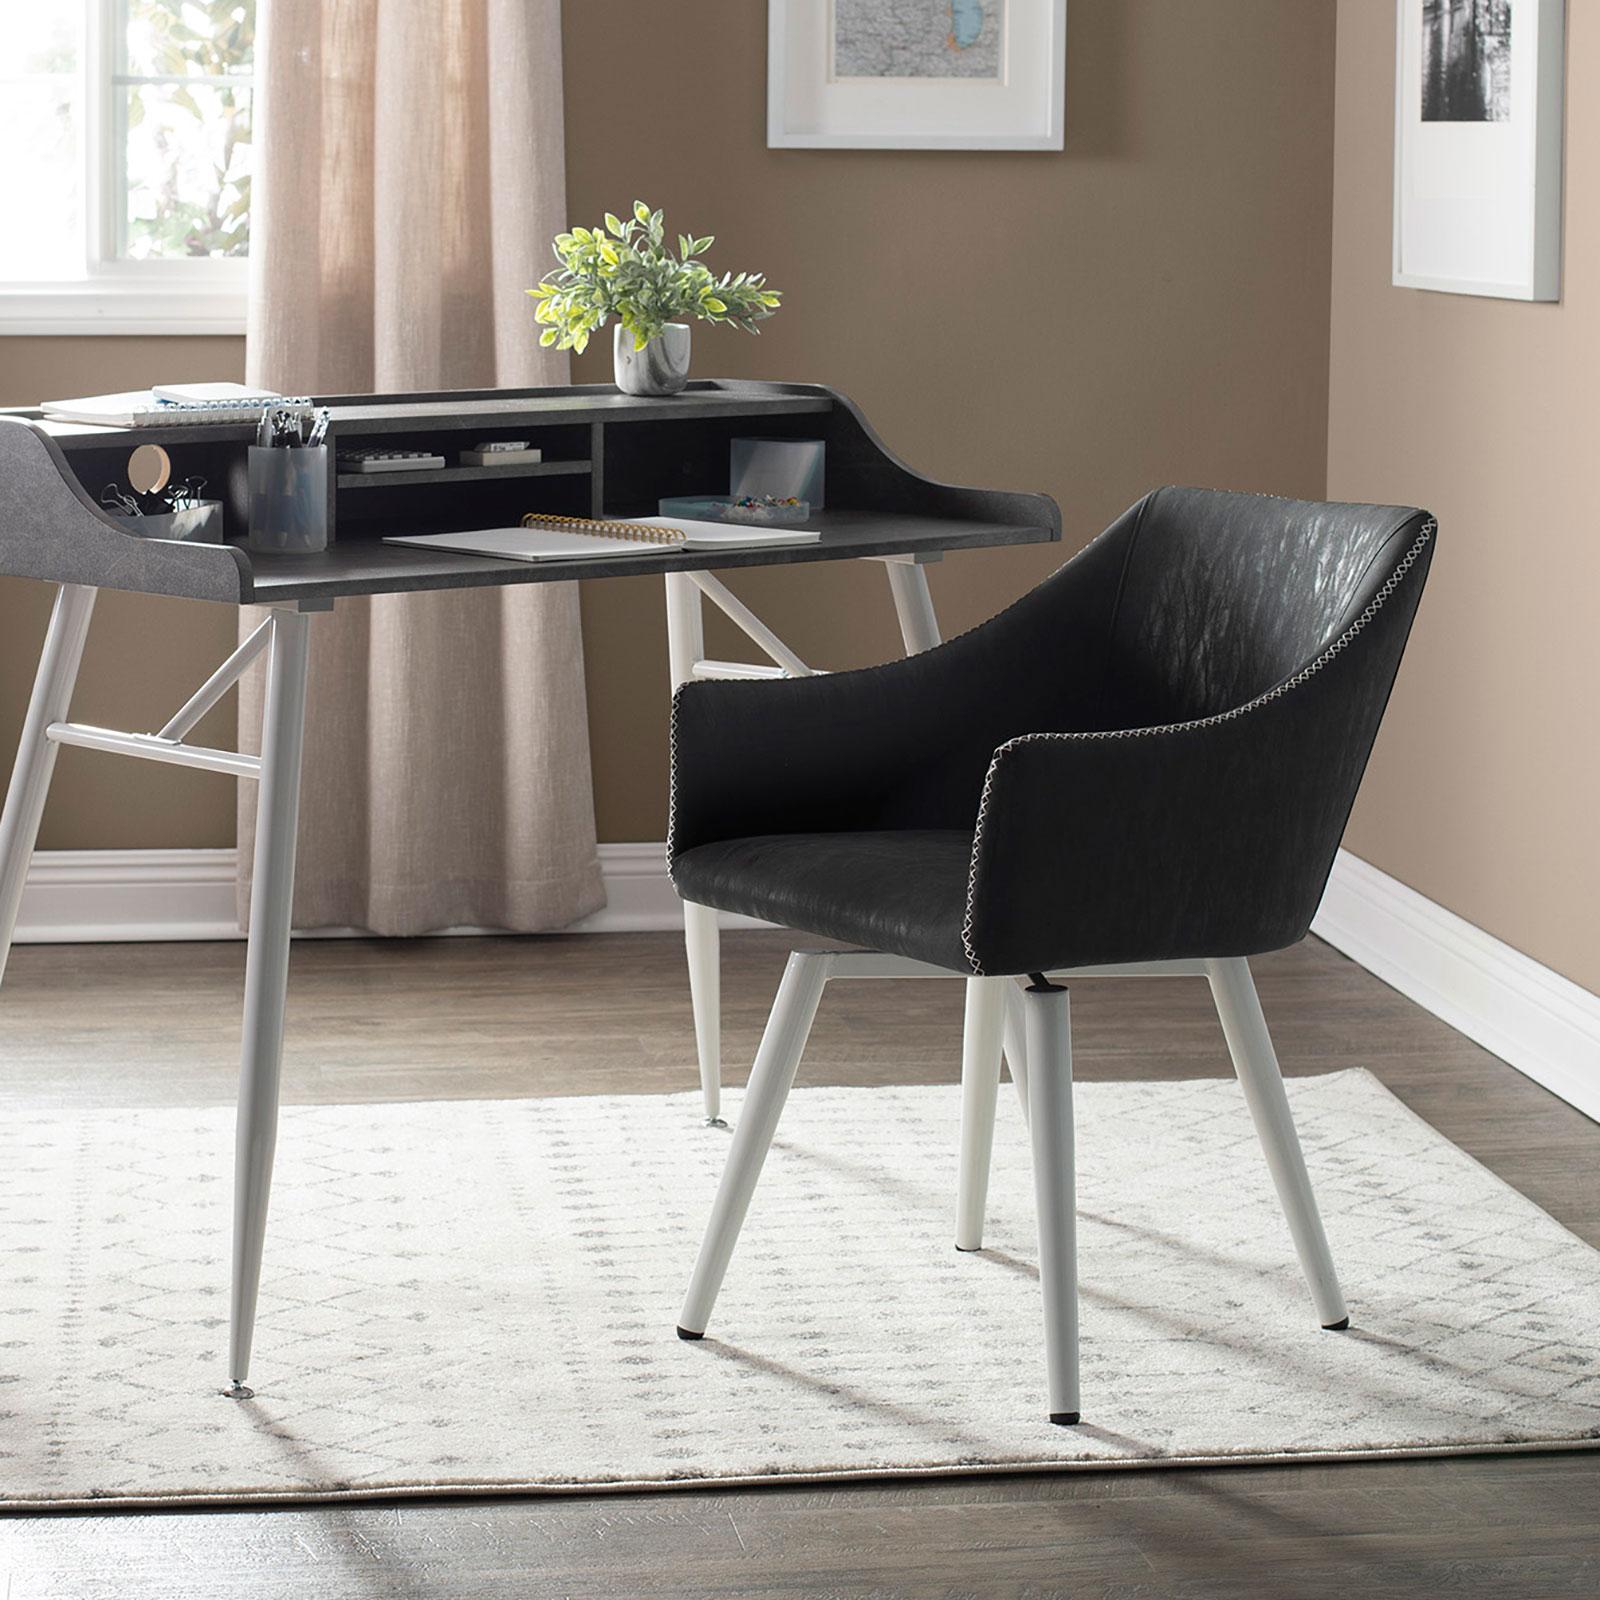 52004-Sydney-Office-Chair-RS1a